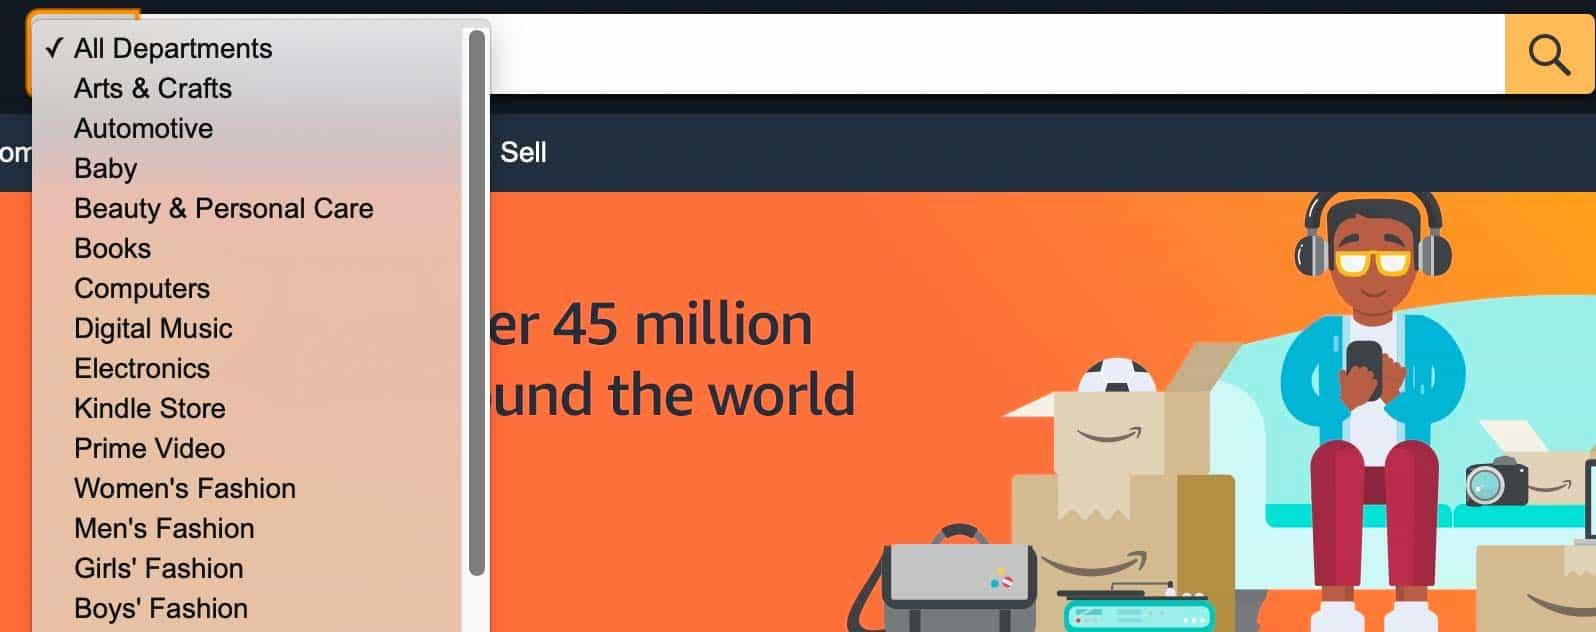 amazon search bar